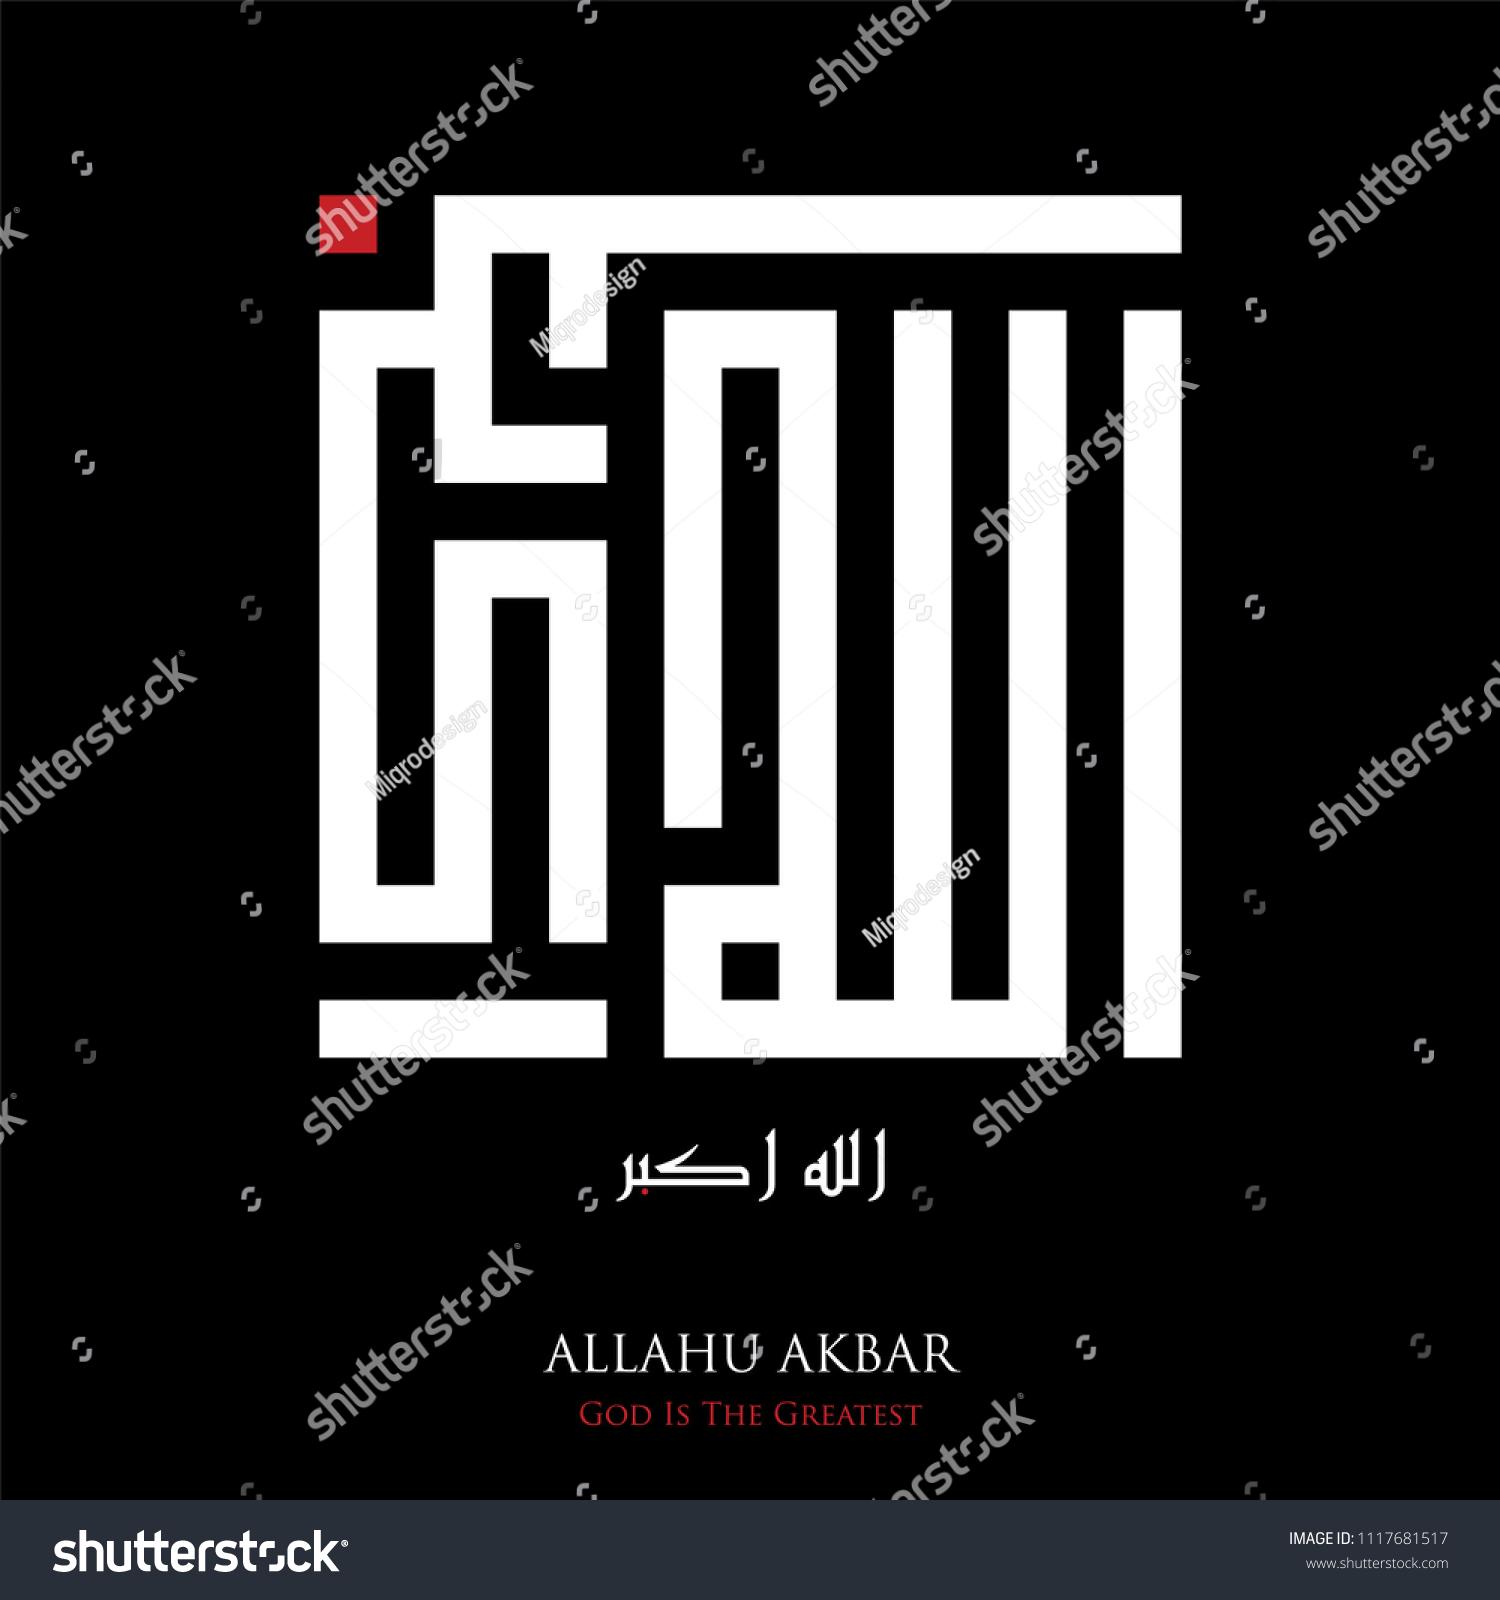 Allah Akbar Musique kufic calligraphy allahu akbar god greater stock vector (royalty